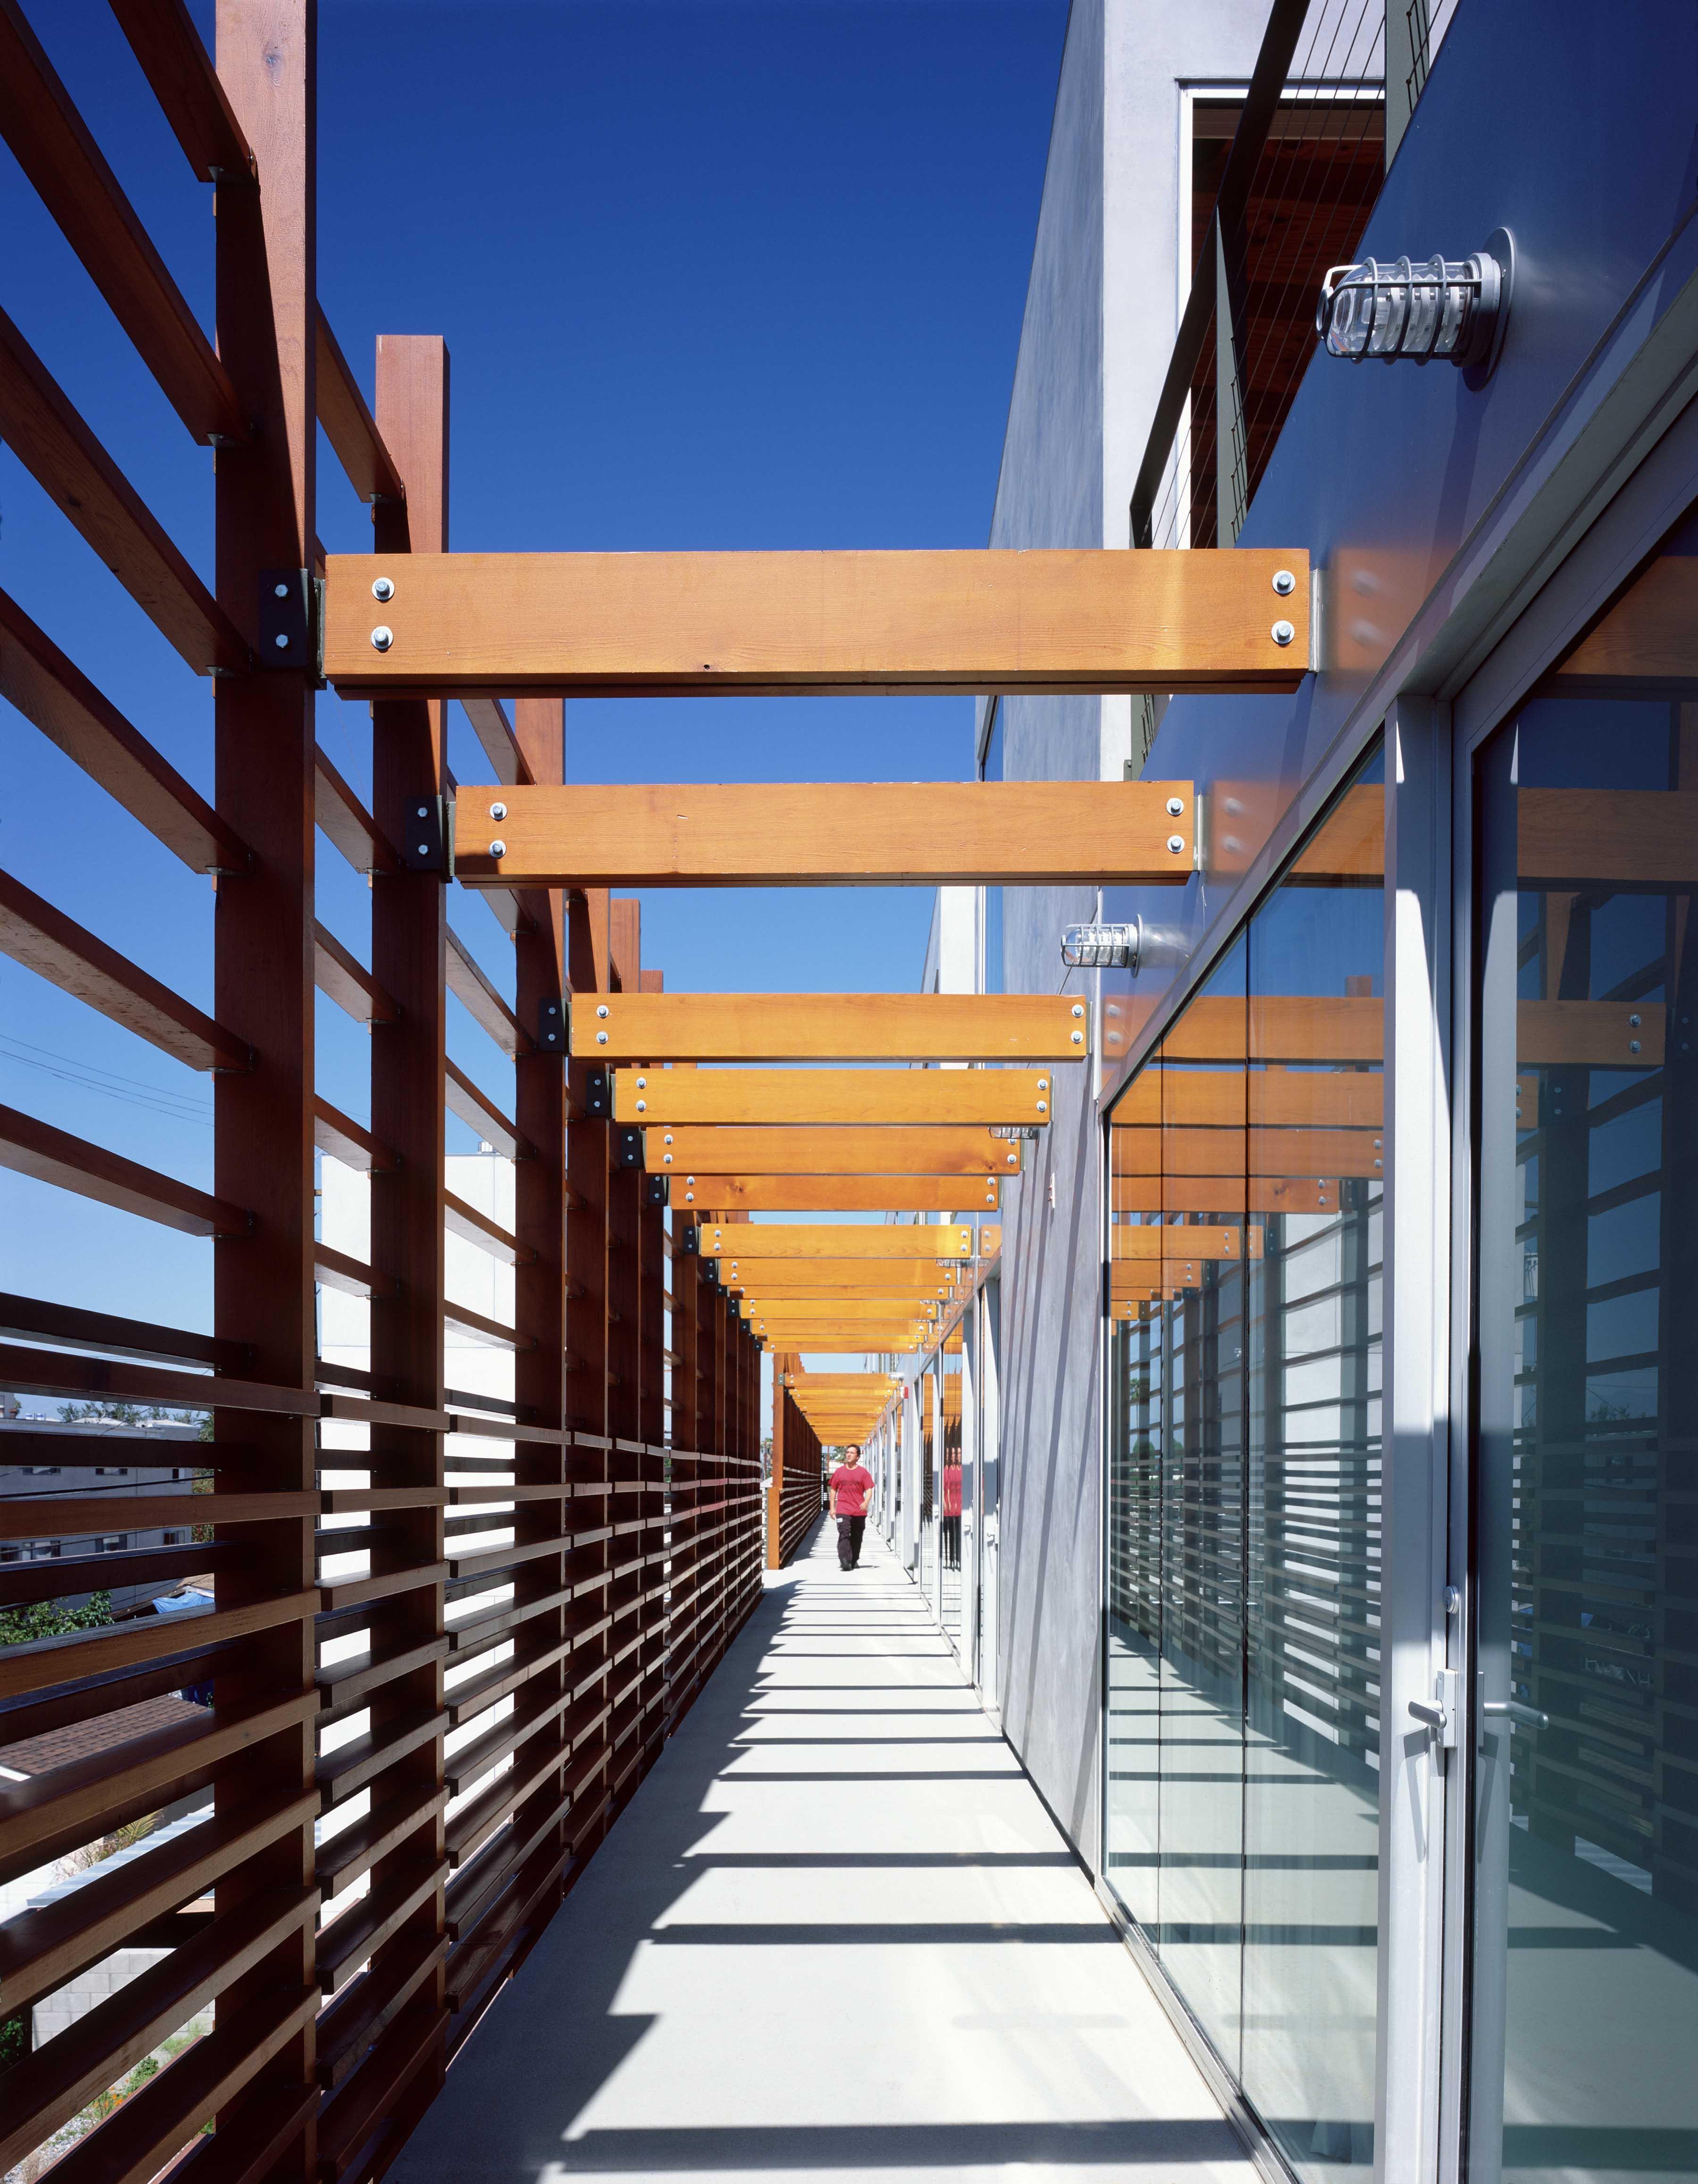 Museum Of Design Art And Architecture Modaa Spf A